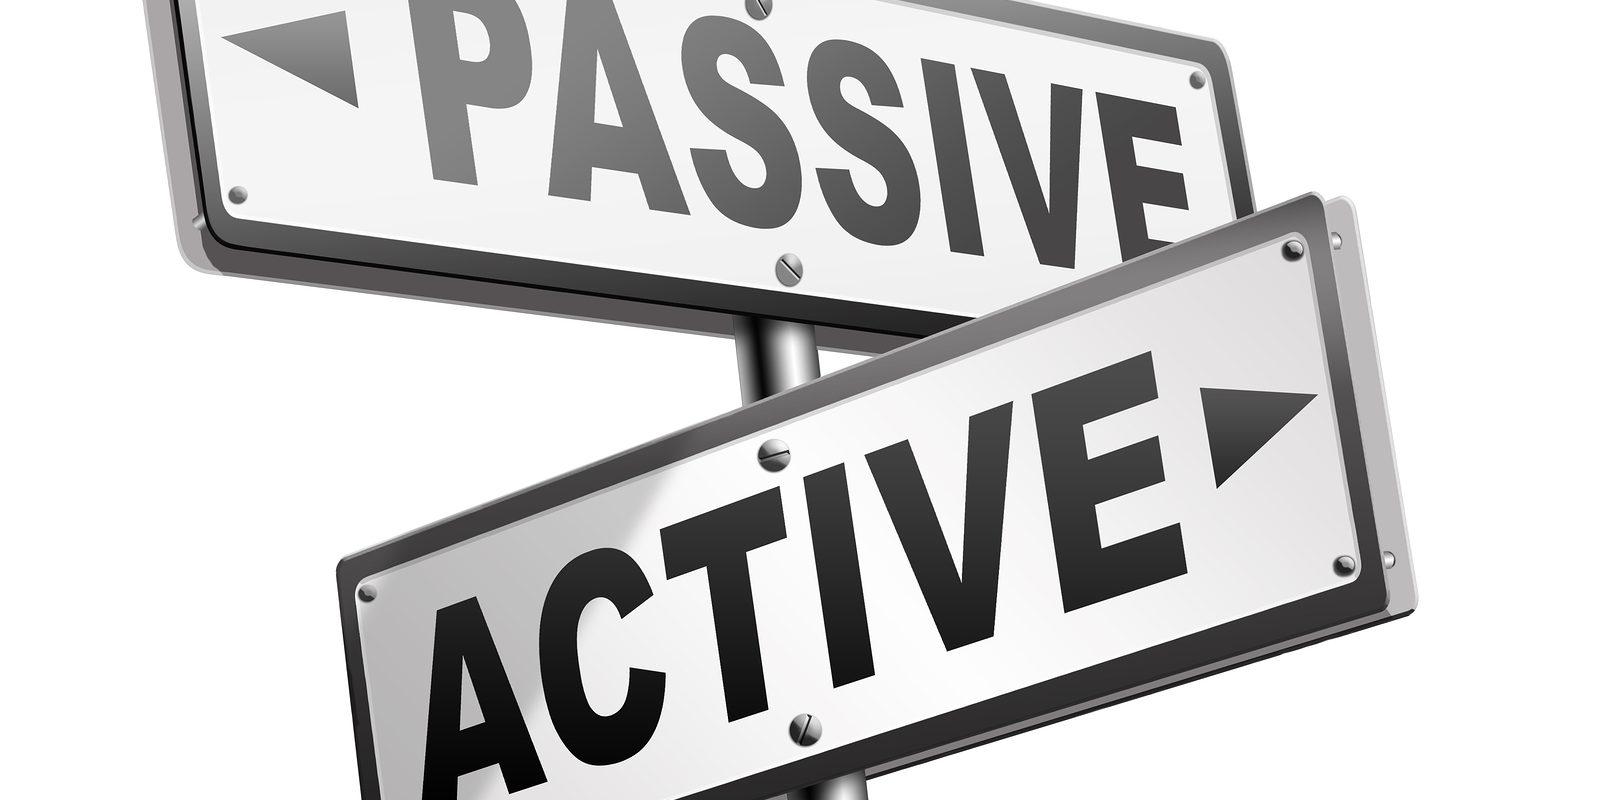 Hello passive goodbye active